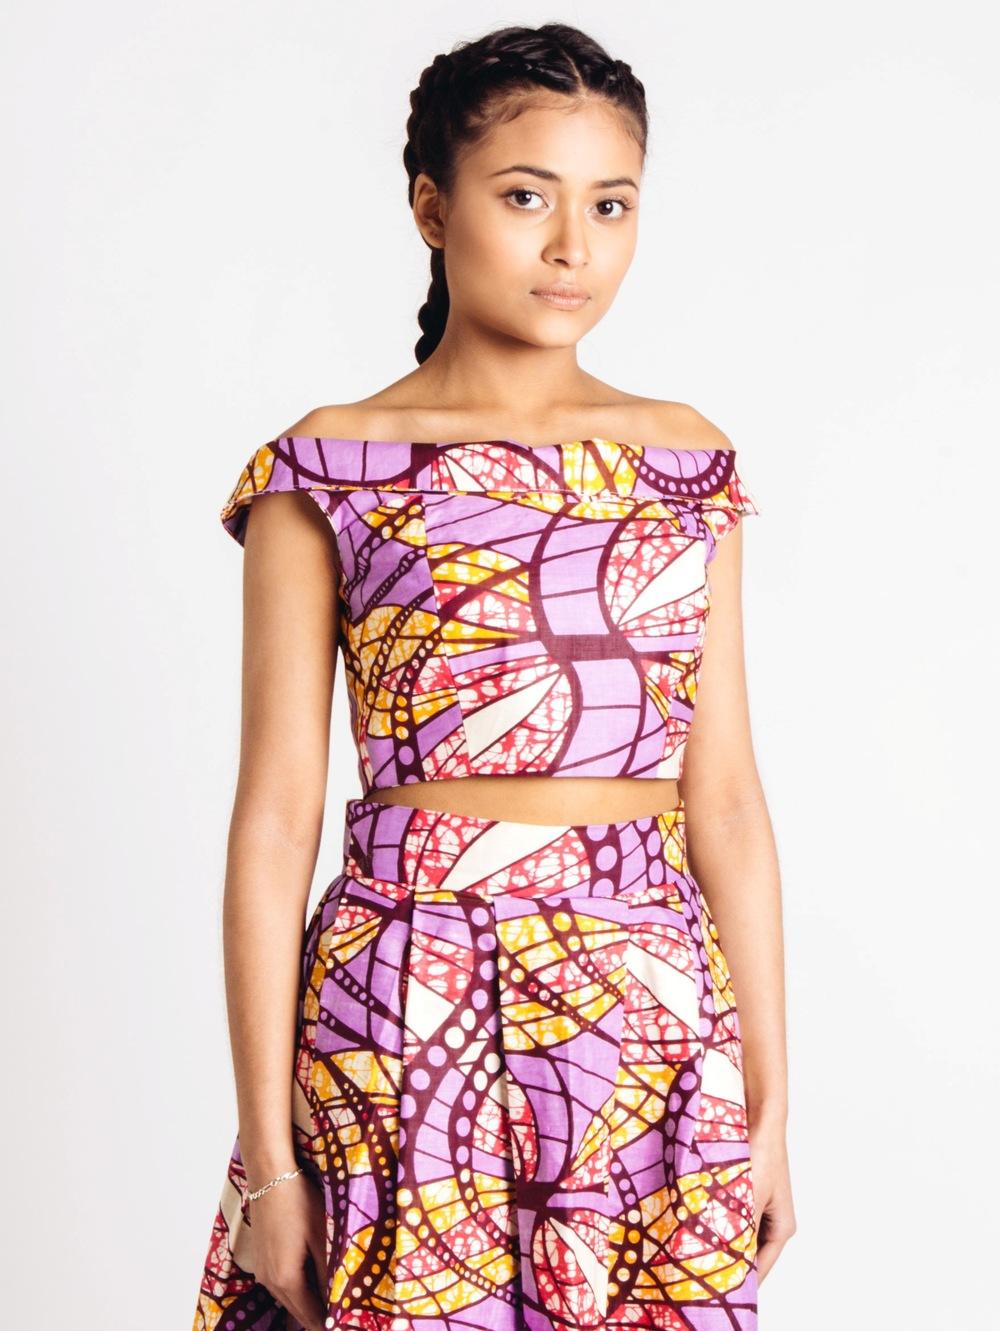 55dae890697c4 Off Shoulder African Print Bustier Top Lilac Pink Orange — Living in Light